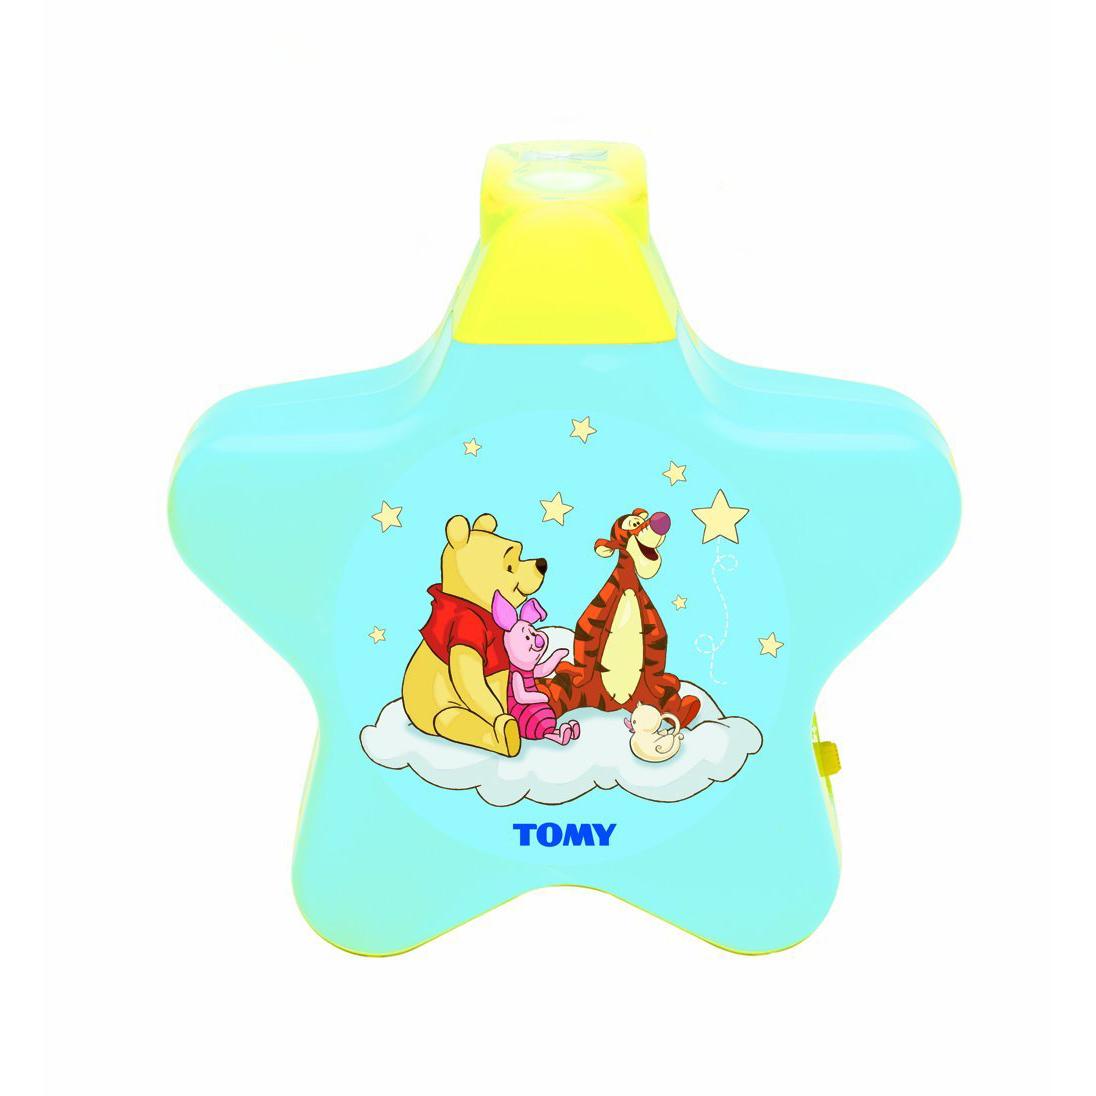 "TOMY 71878 - Winnie Puuh ""Sternenlicht"" Bild https://cdn03.plentymarkets.com/zsy4vjx32p87/item/images/5315/full/TOM71878-ama-01.jpg"